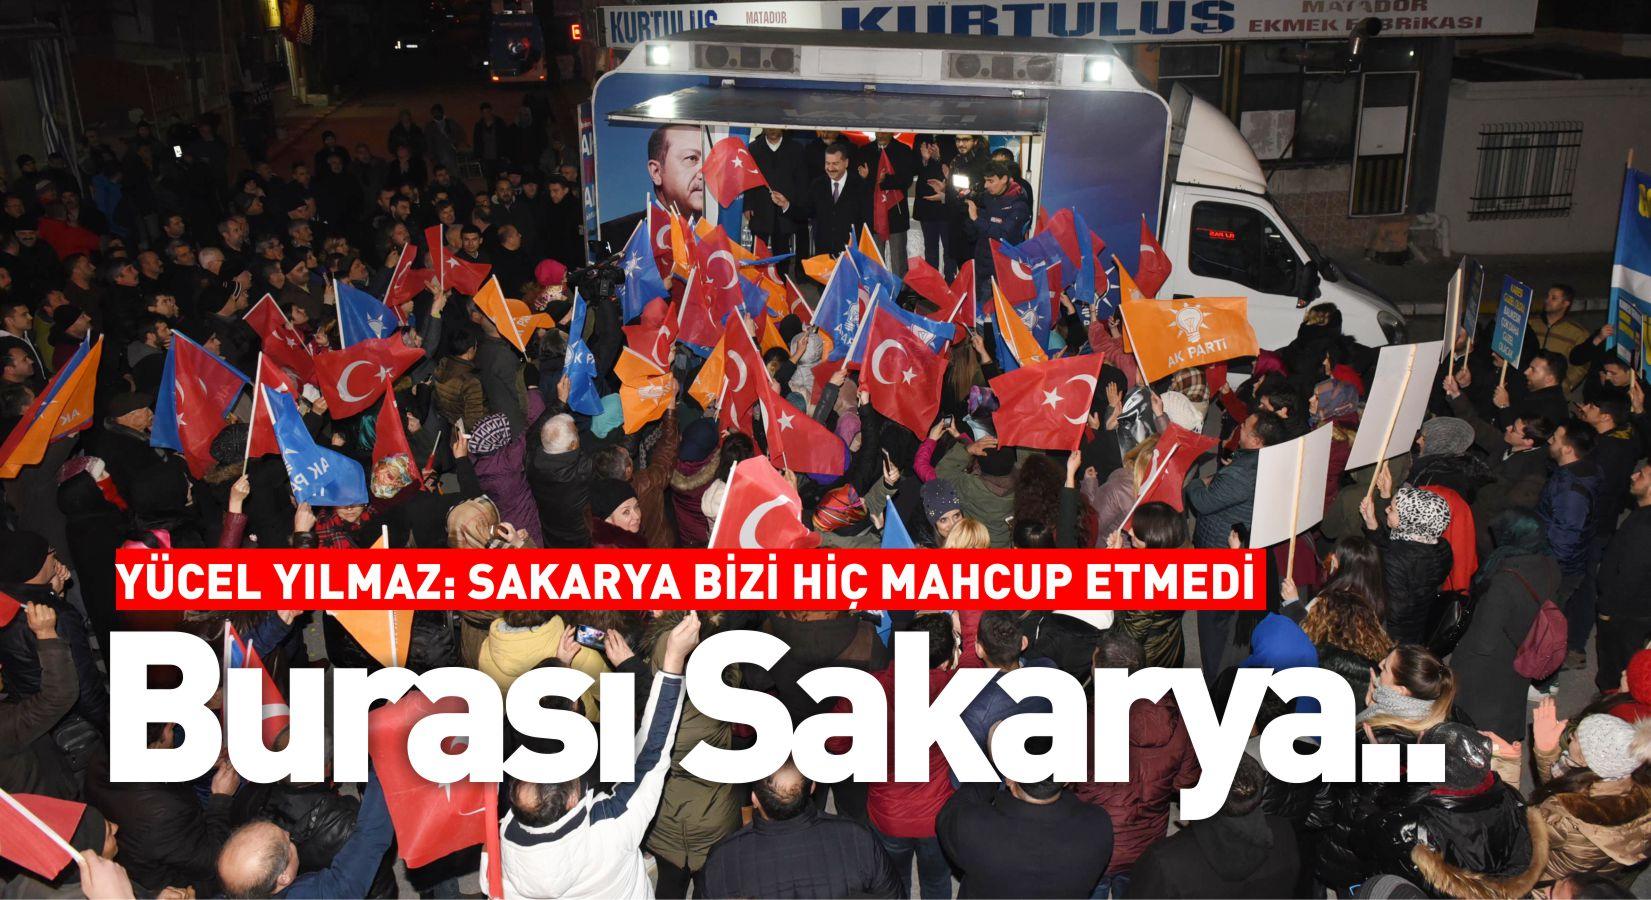 """SAKARYA BİZİ HİÇ BİR ZAMAN MAHCUP ETMEDİ"""